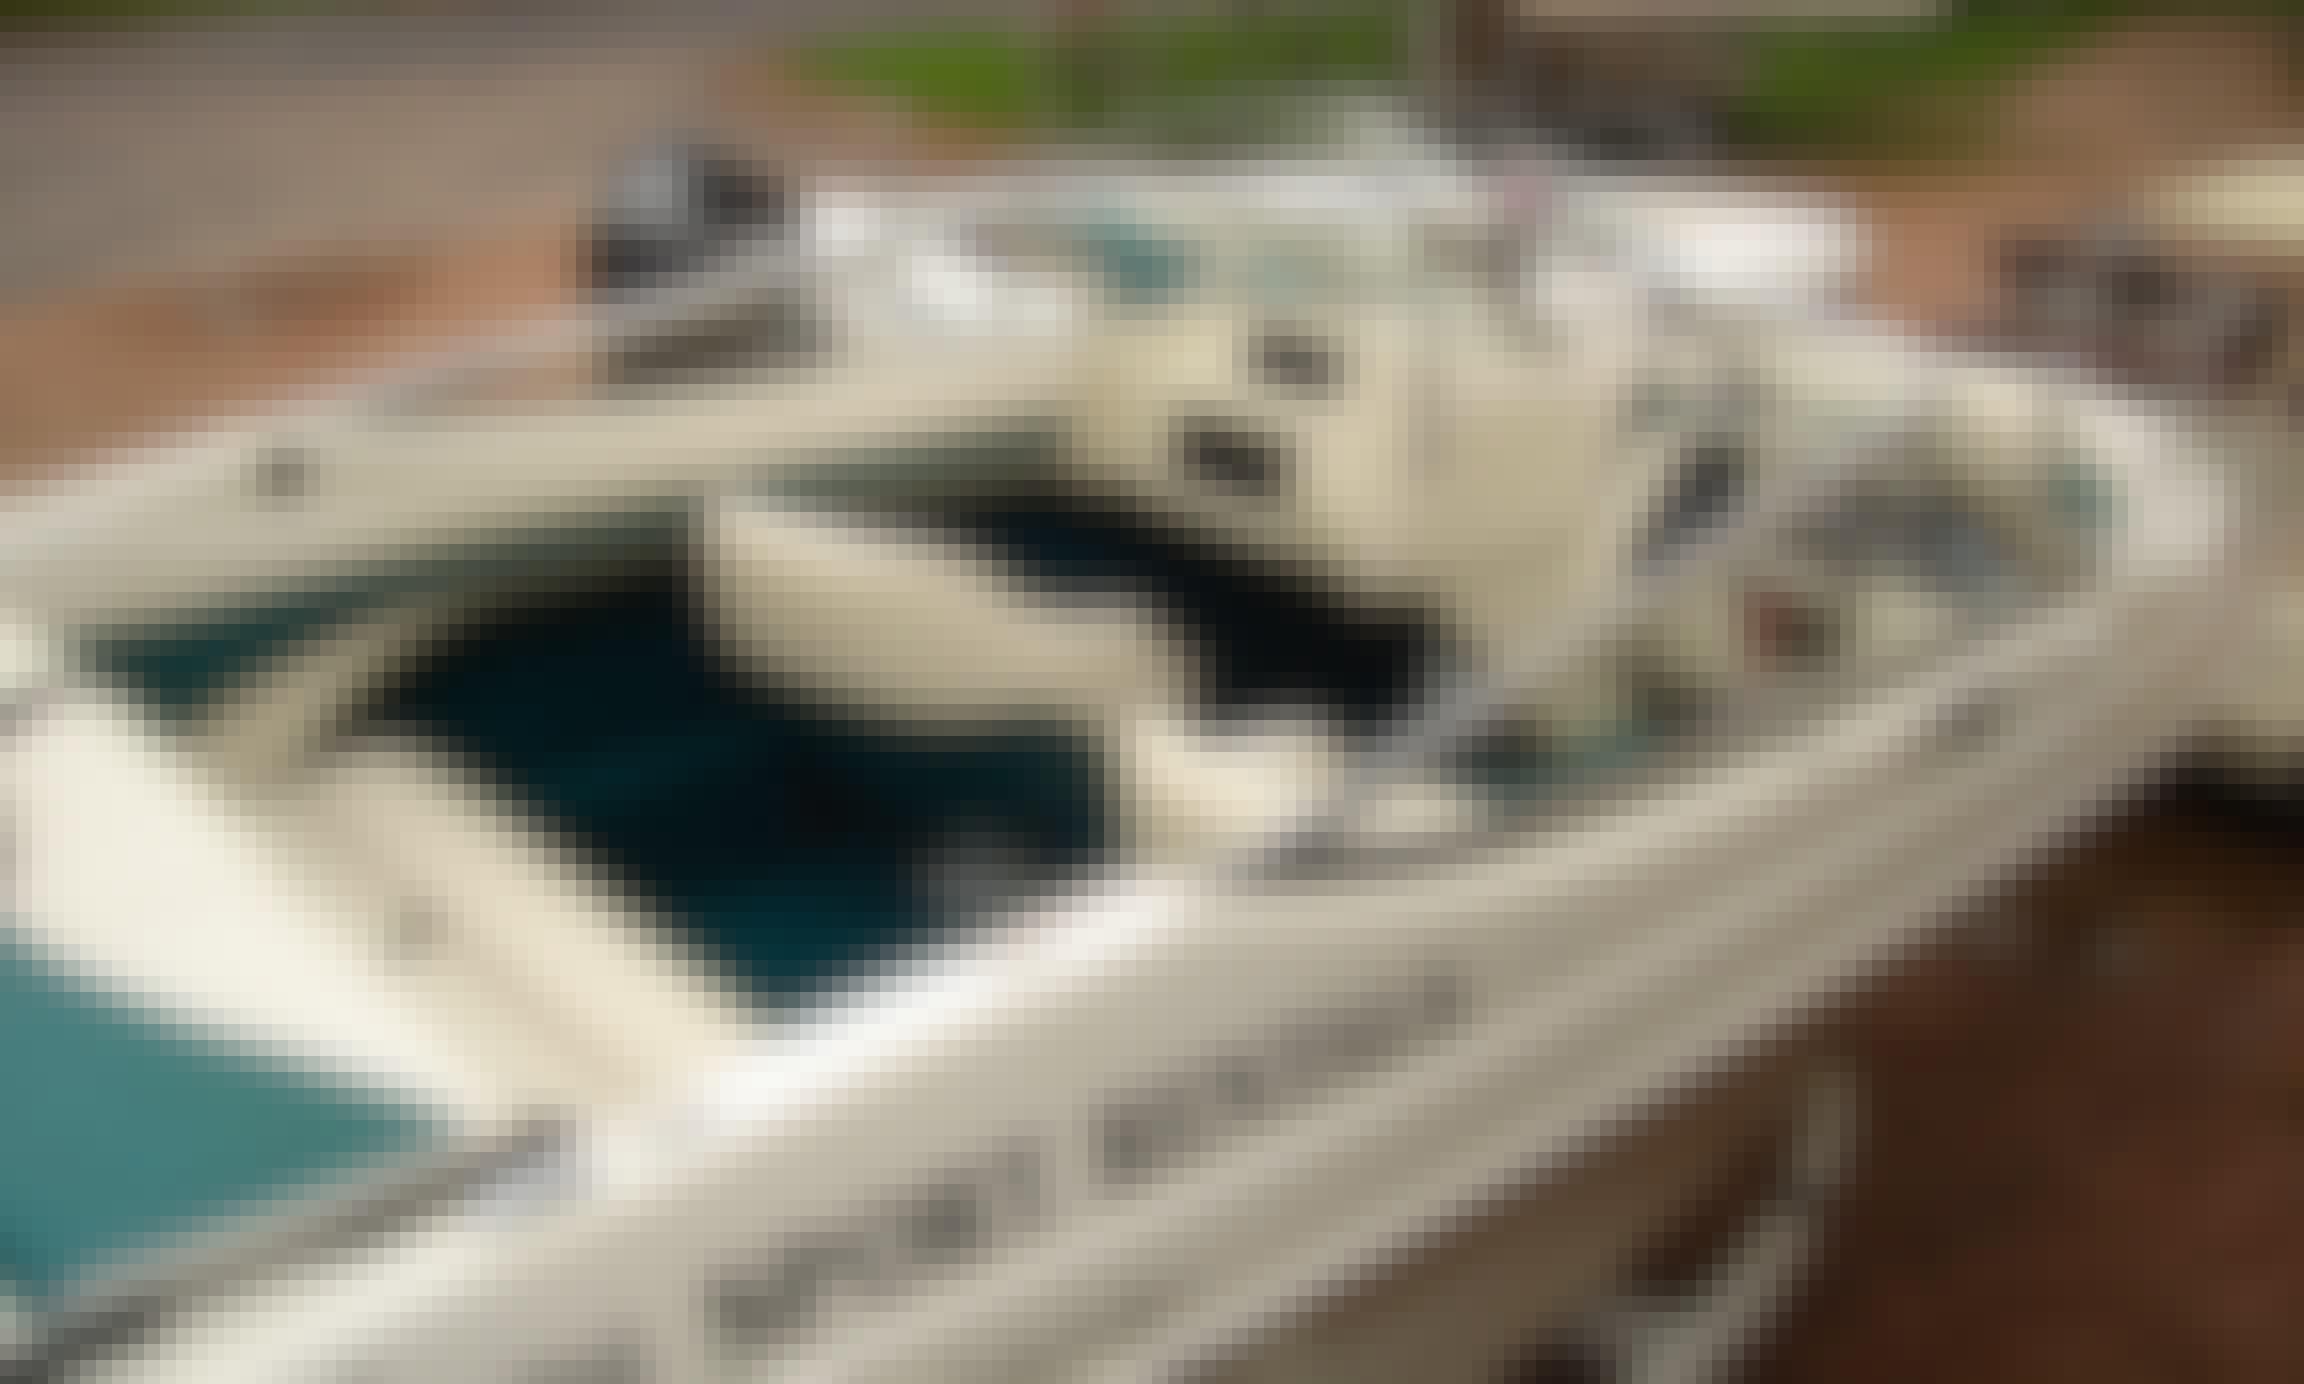 Bowrider Rental in Minocqua